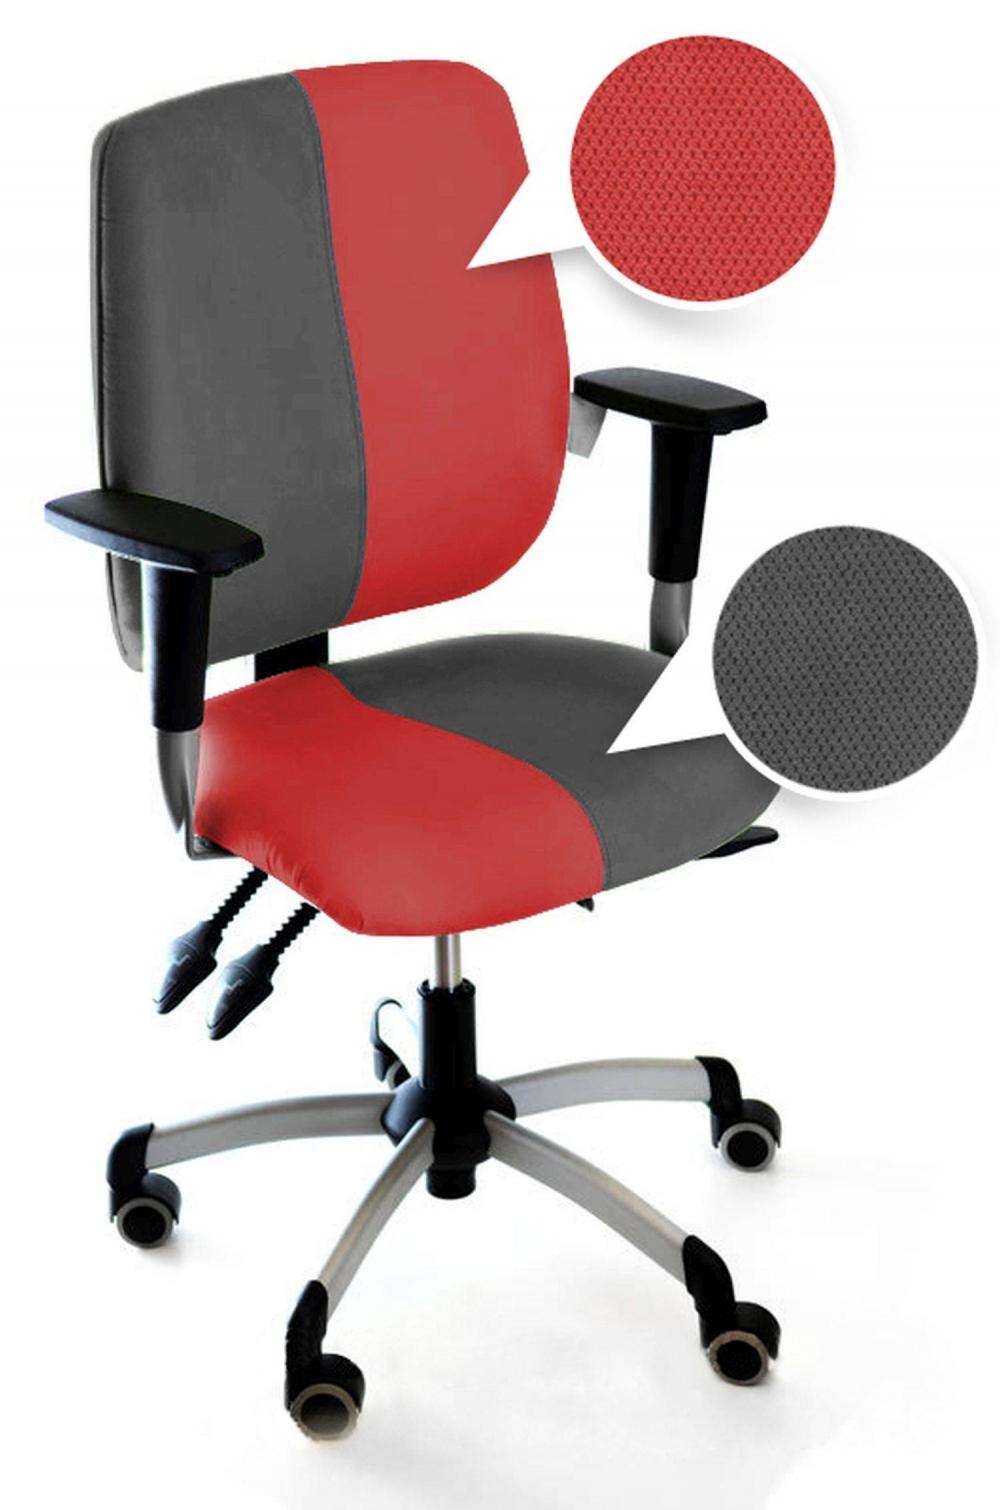 Detská rastúca stolička NO LIMIT KIDS │60 červená / 94 sivá /ch 94